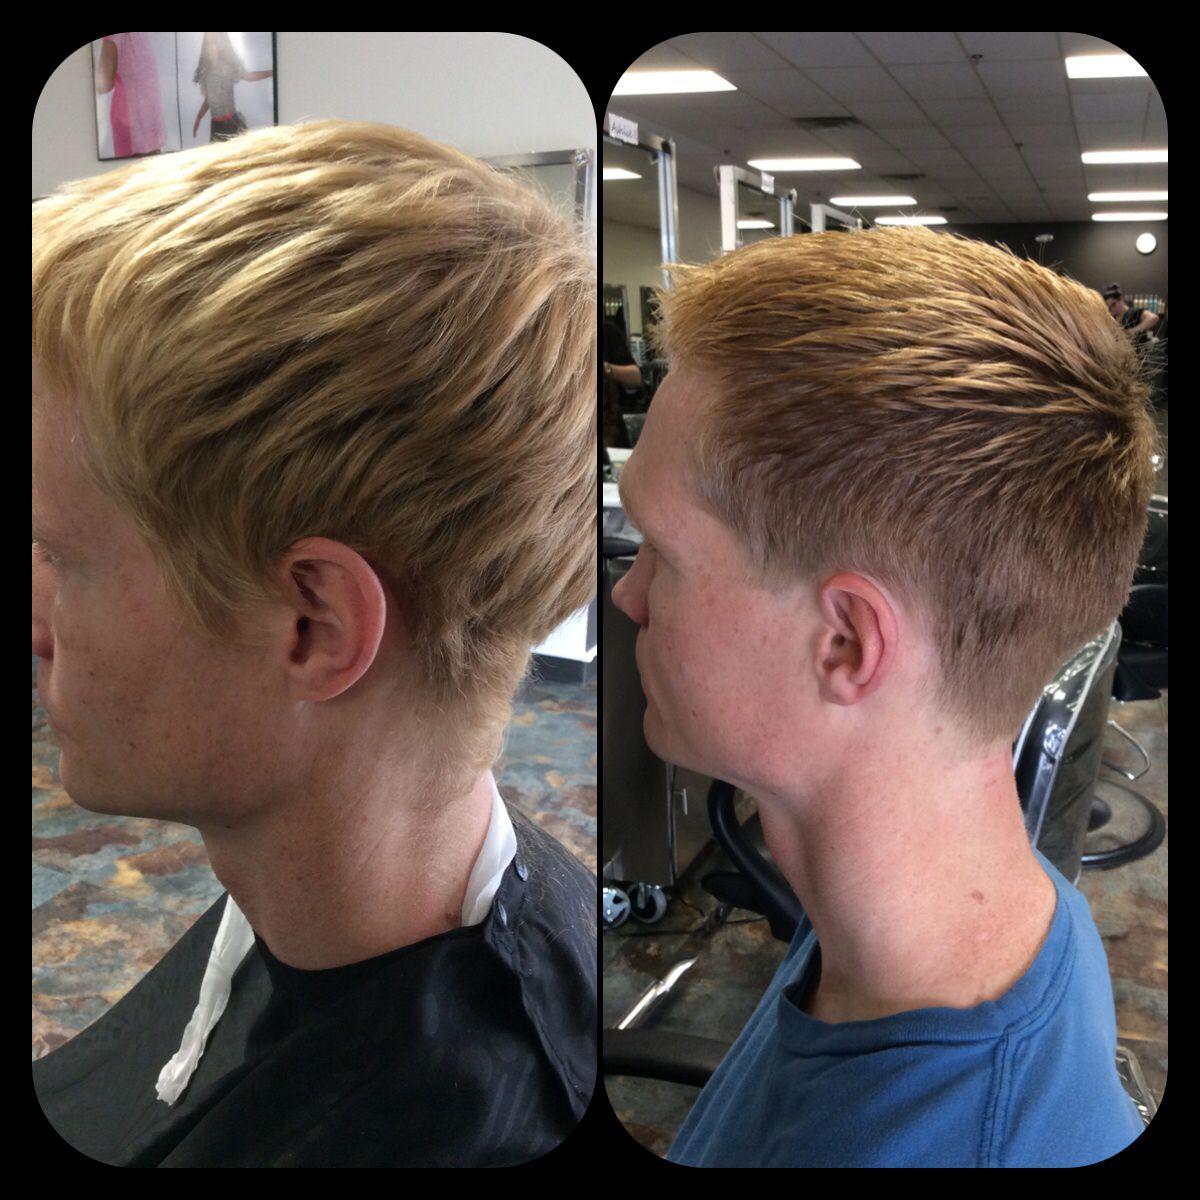 Evcc Cosmetology Beauty School Haircut Clippercut Handsome